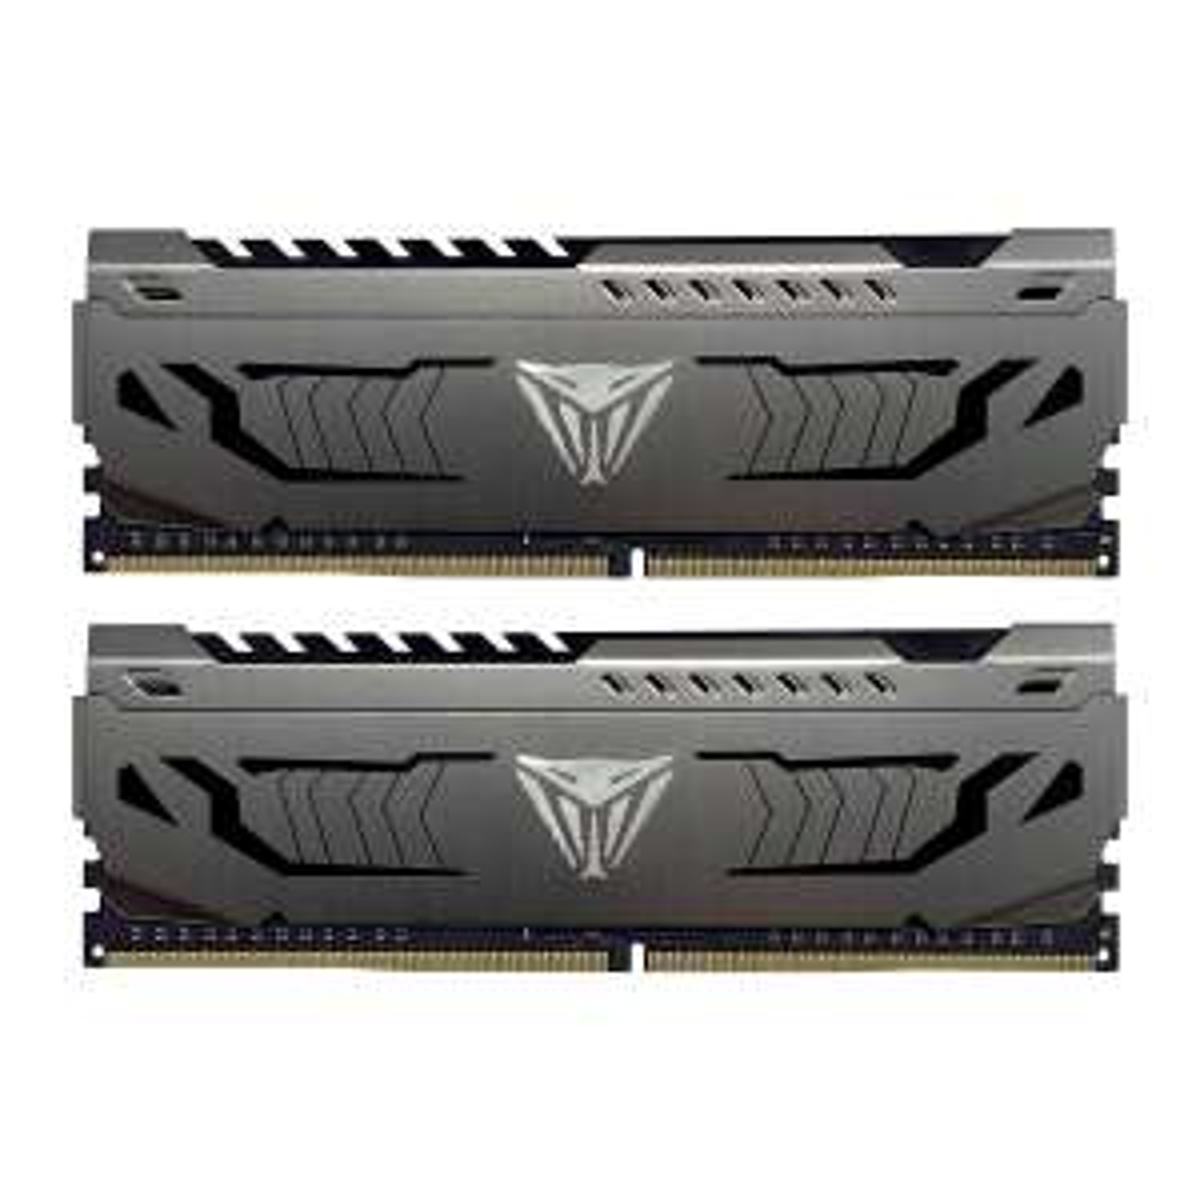 Patriot Viper Steel Series 16GB (2x 8GB) 3866MHz CAS 18 DDR4 RAM £93.14 delivered at CCLOnline